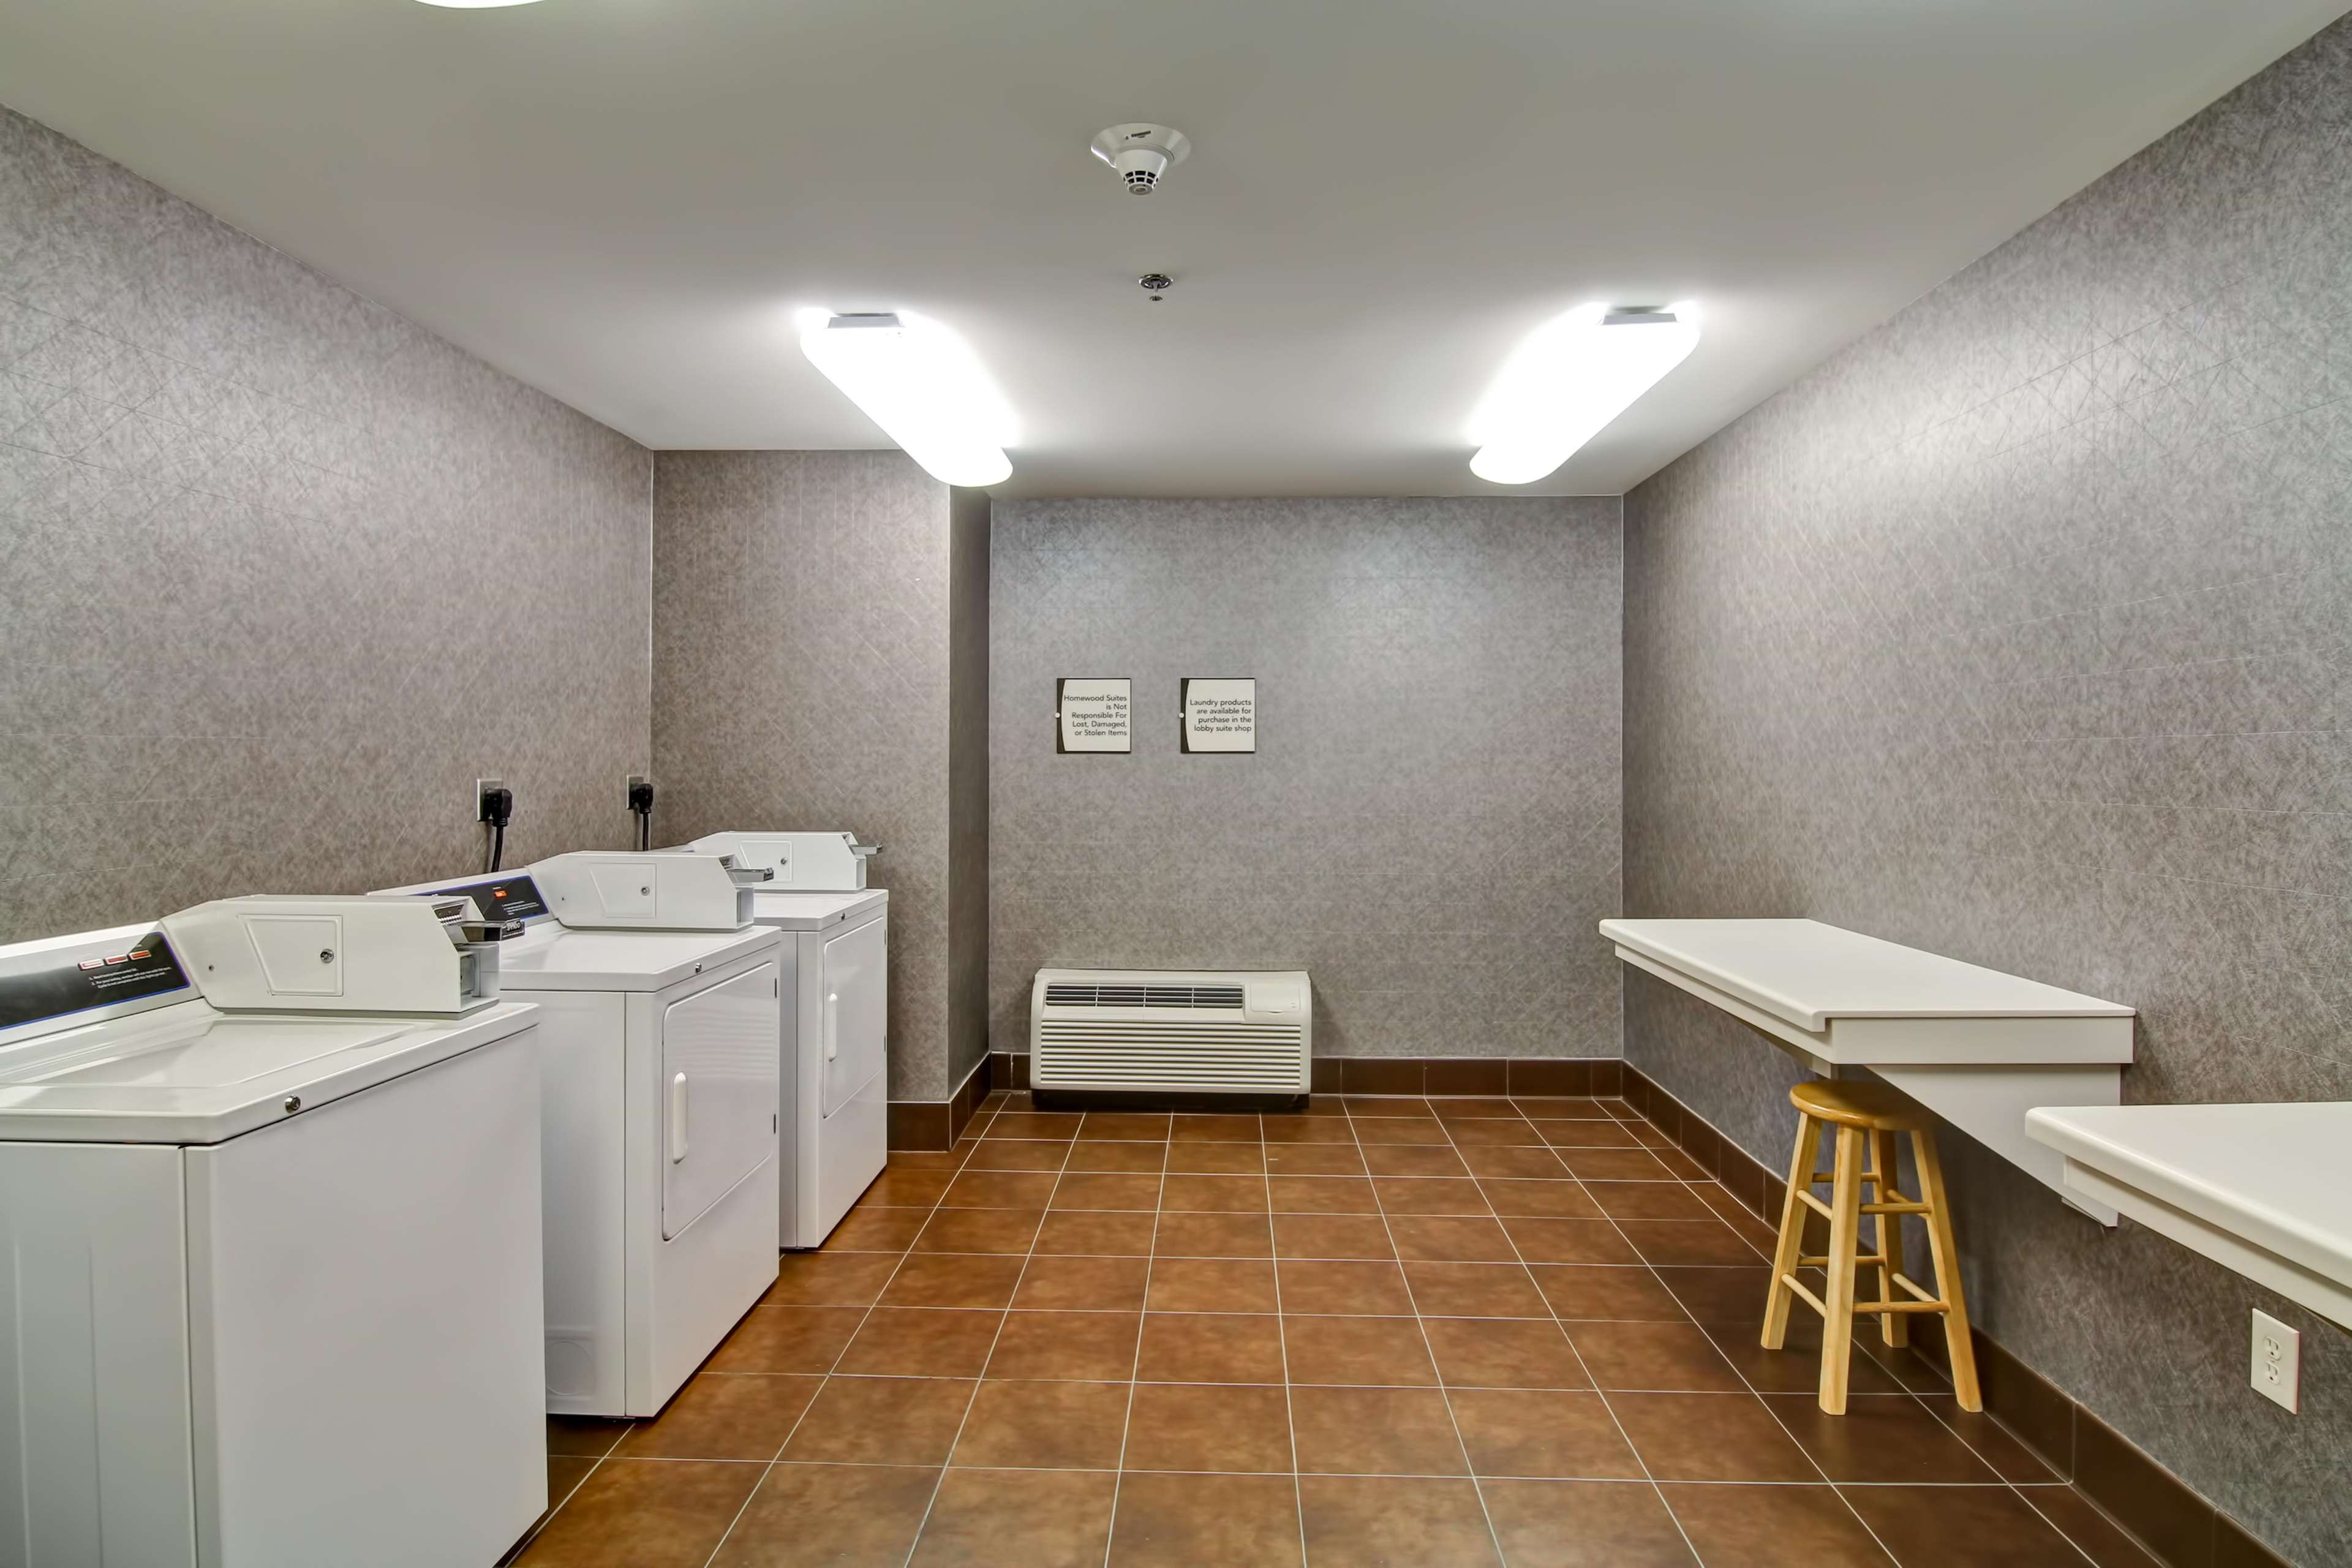 Homewood Suites by Hilton Cincinnati Airport South-Florence image 41